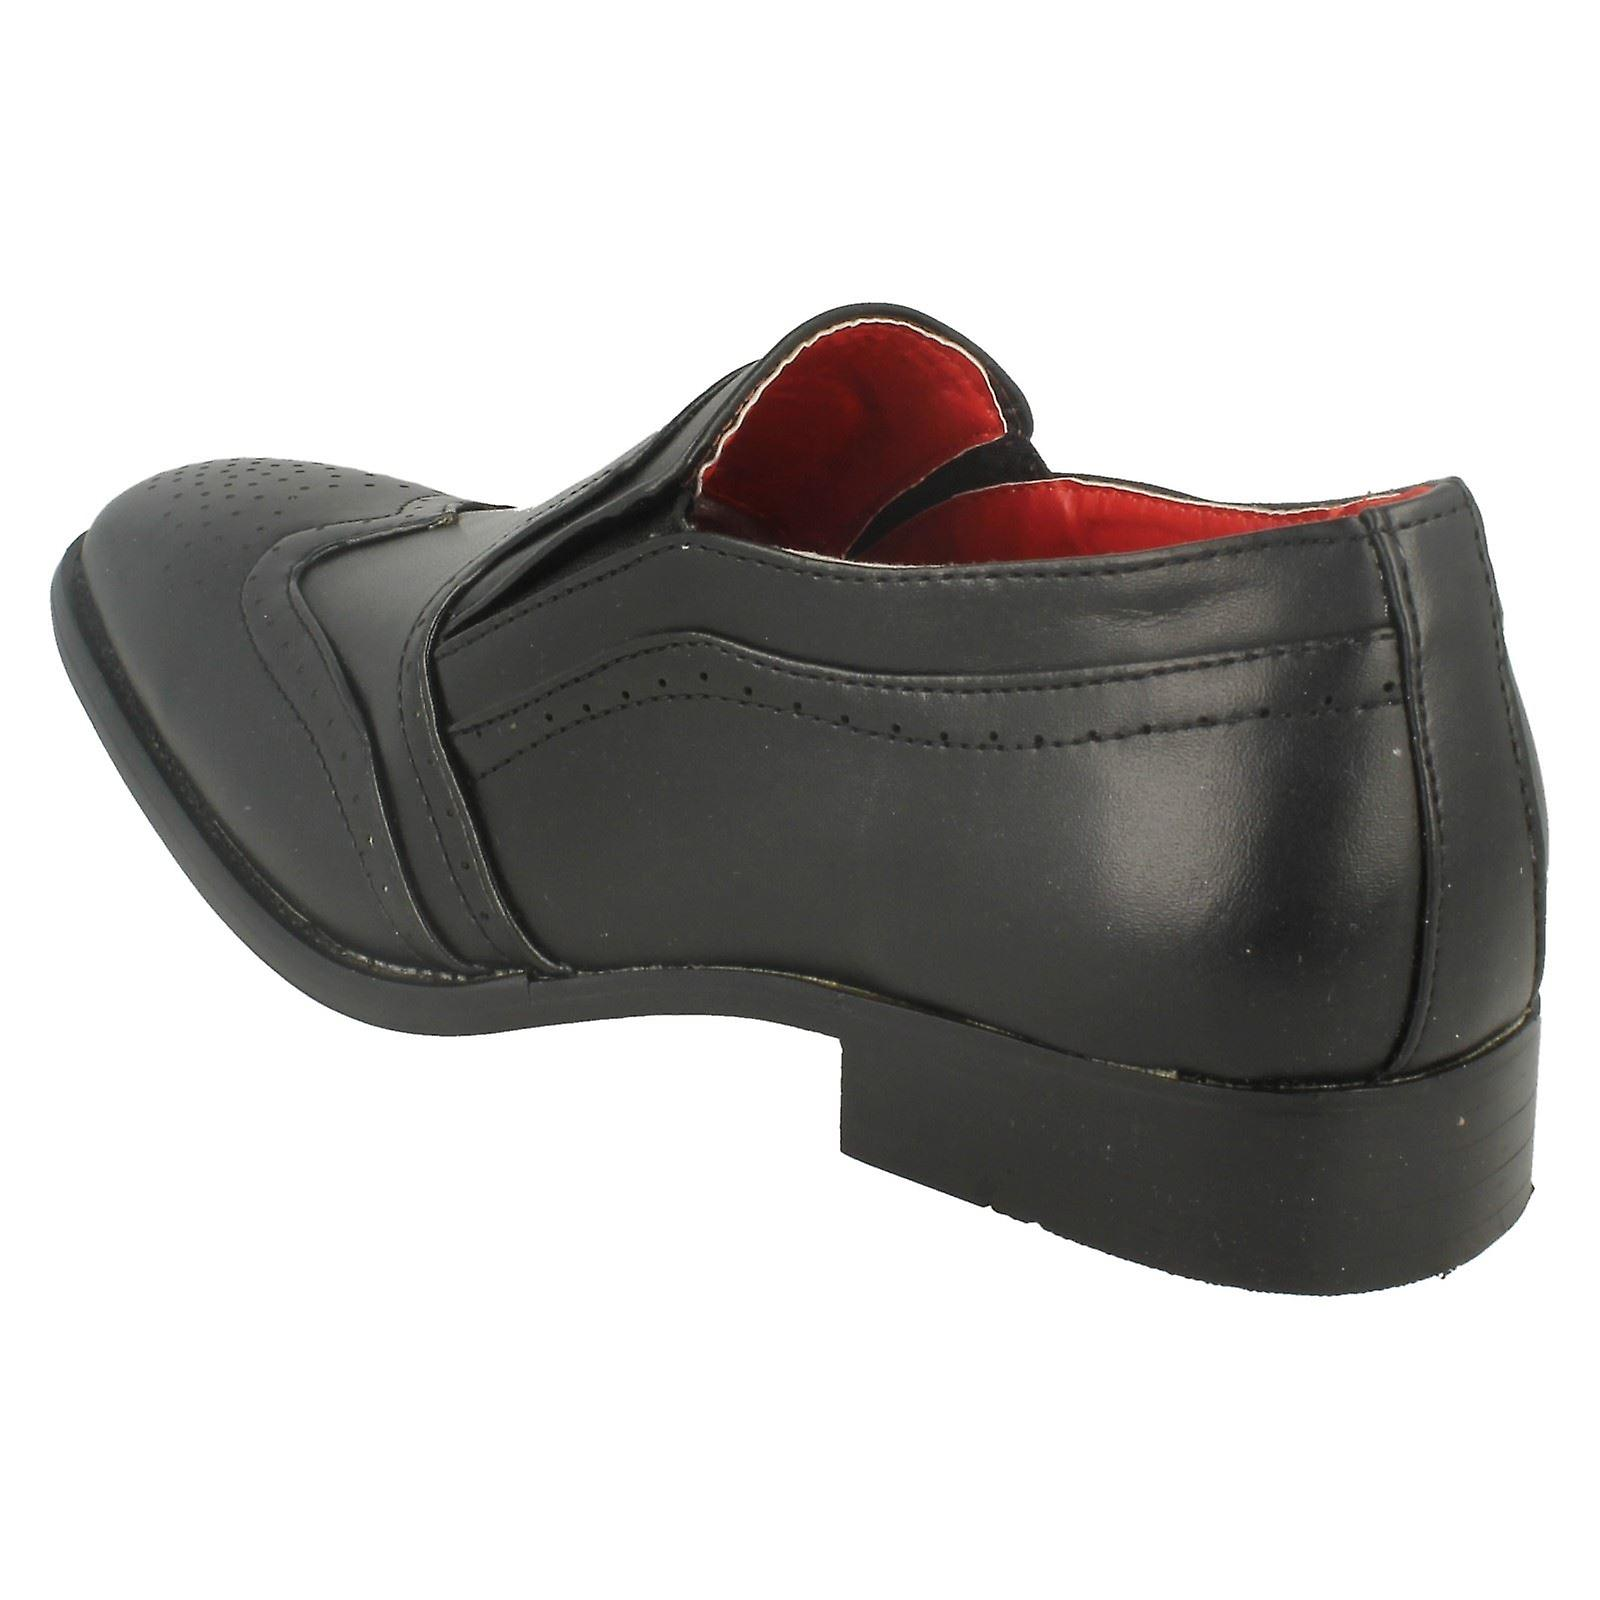 Shoes Mens Maverick Formal